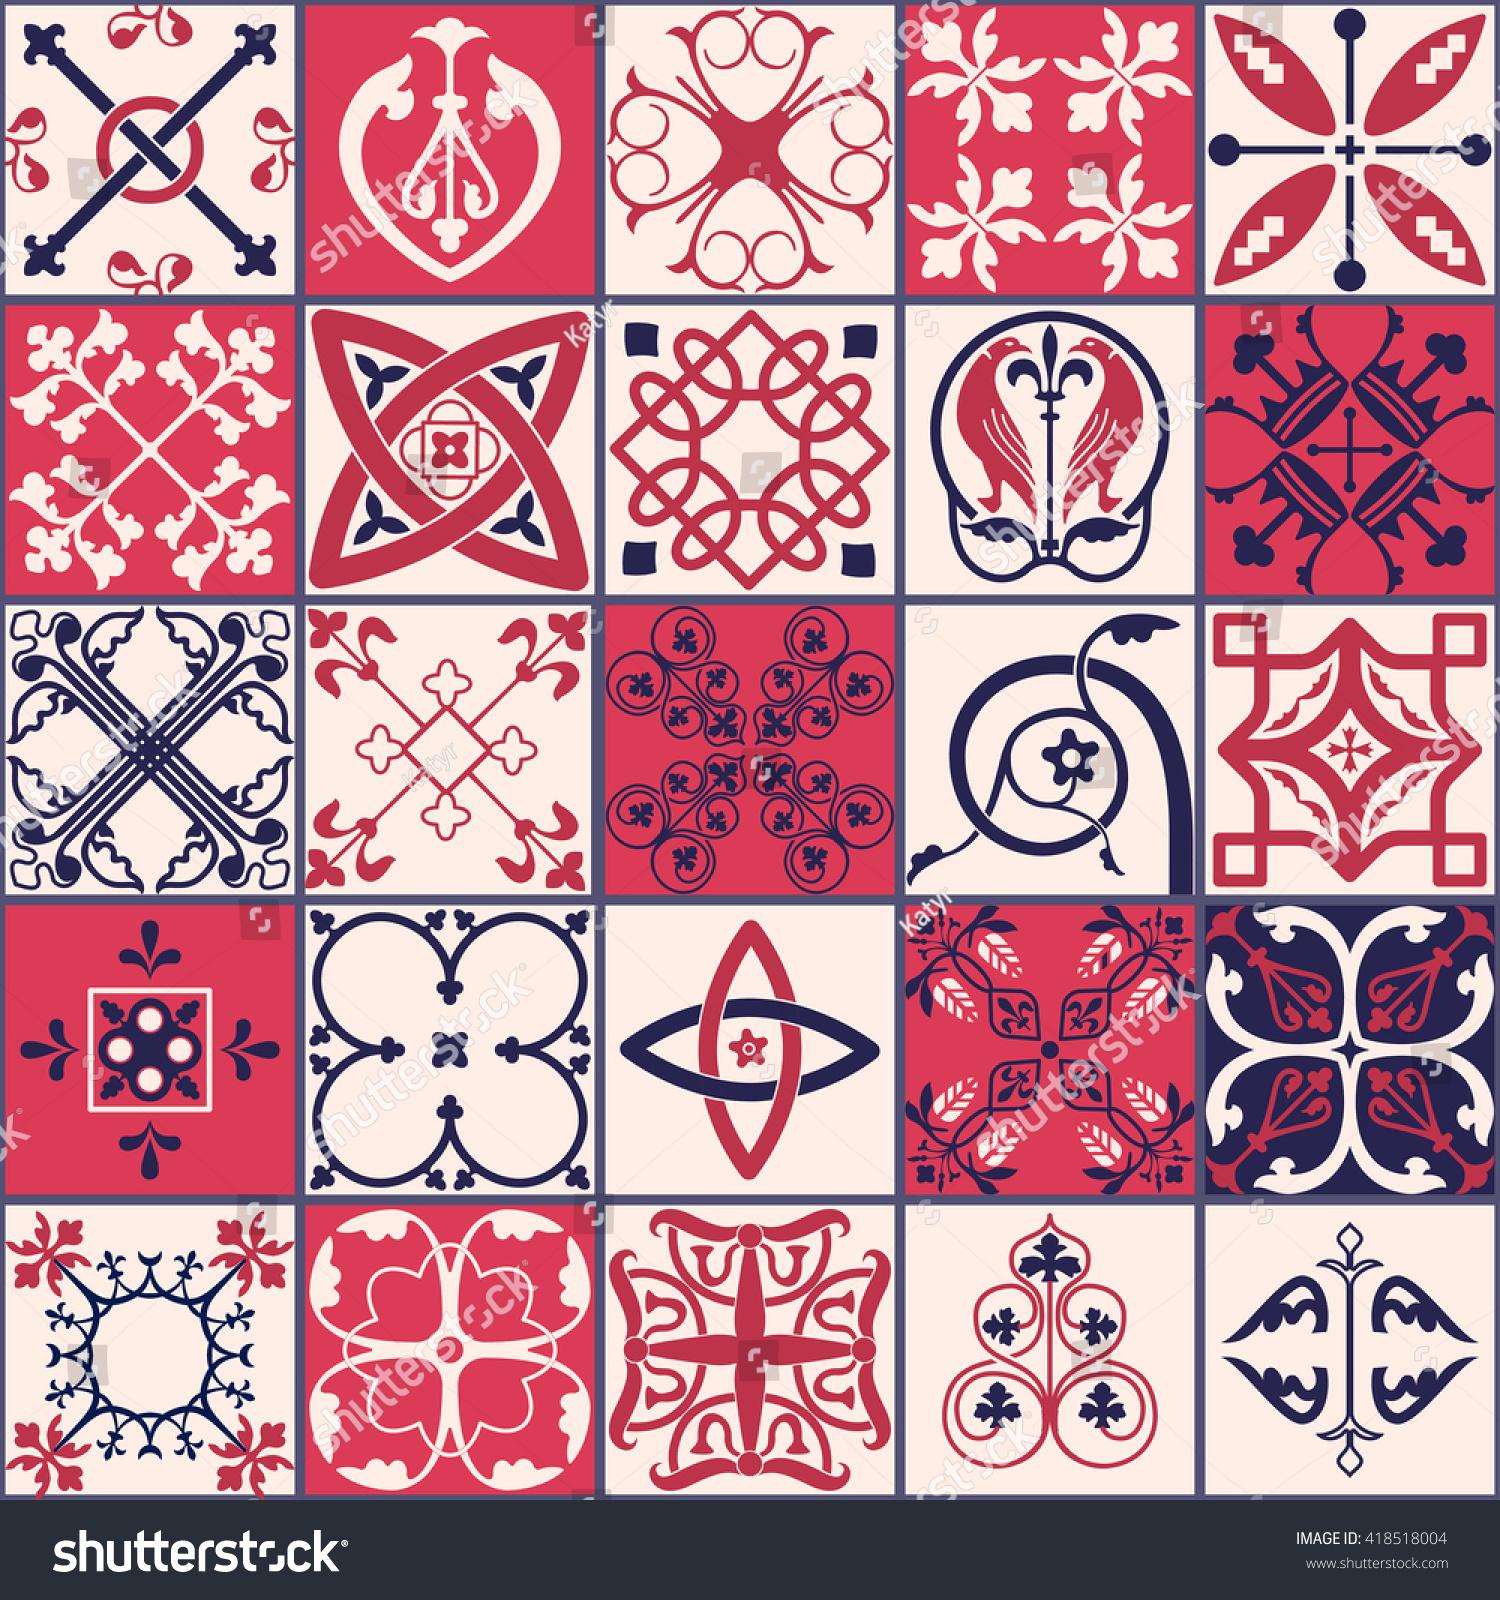 Vector of moroccan tile seamless pattern tile for design tile - Vector Of Moroccan Tile Seamless Pattern For Design Background Banner Spanish Tile Element